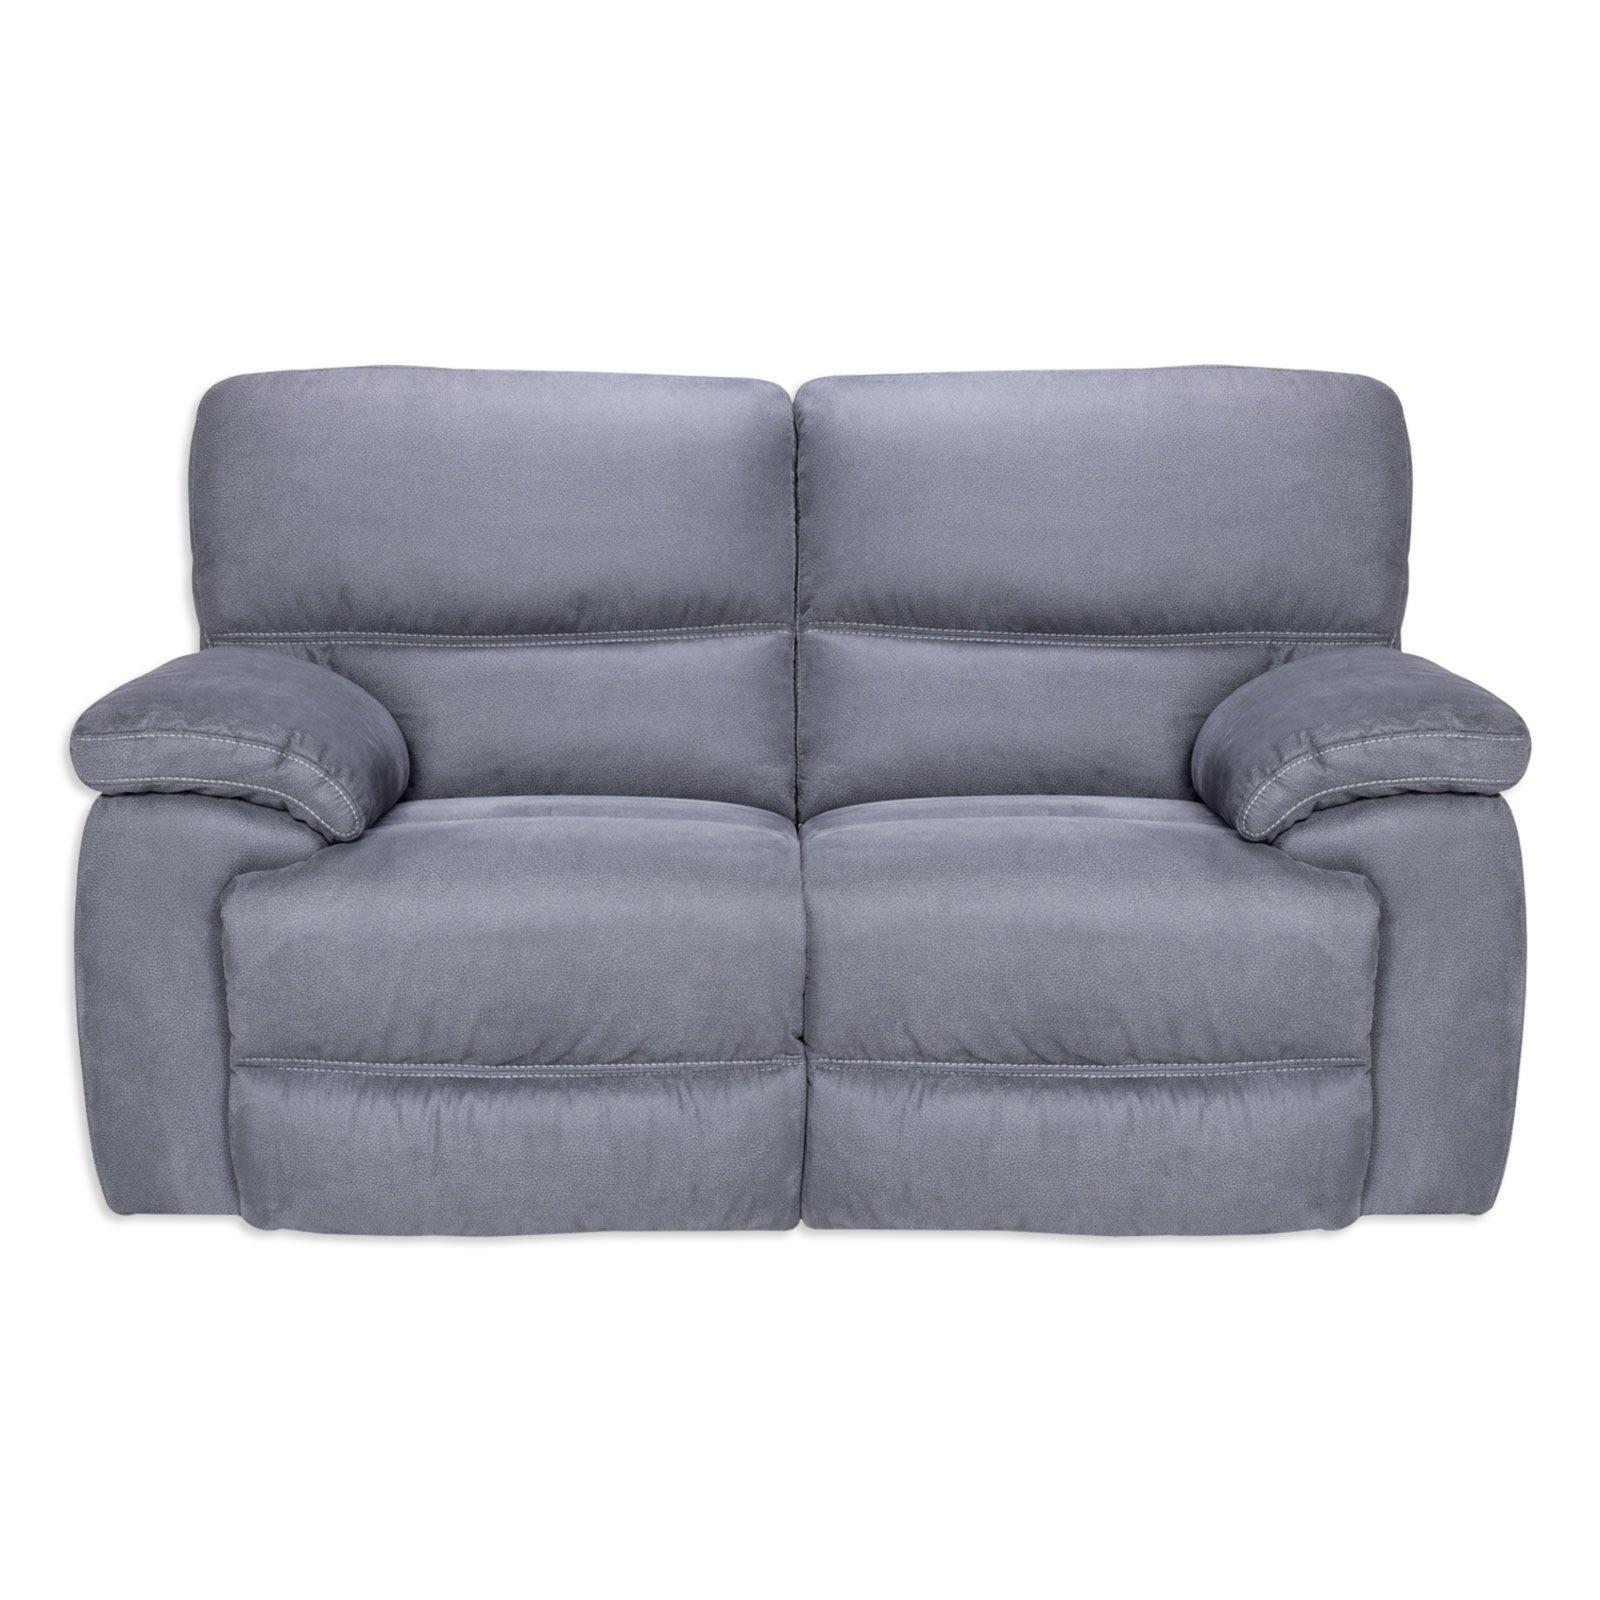 2 Sitzer Sofa Grau Microfaser